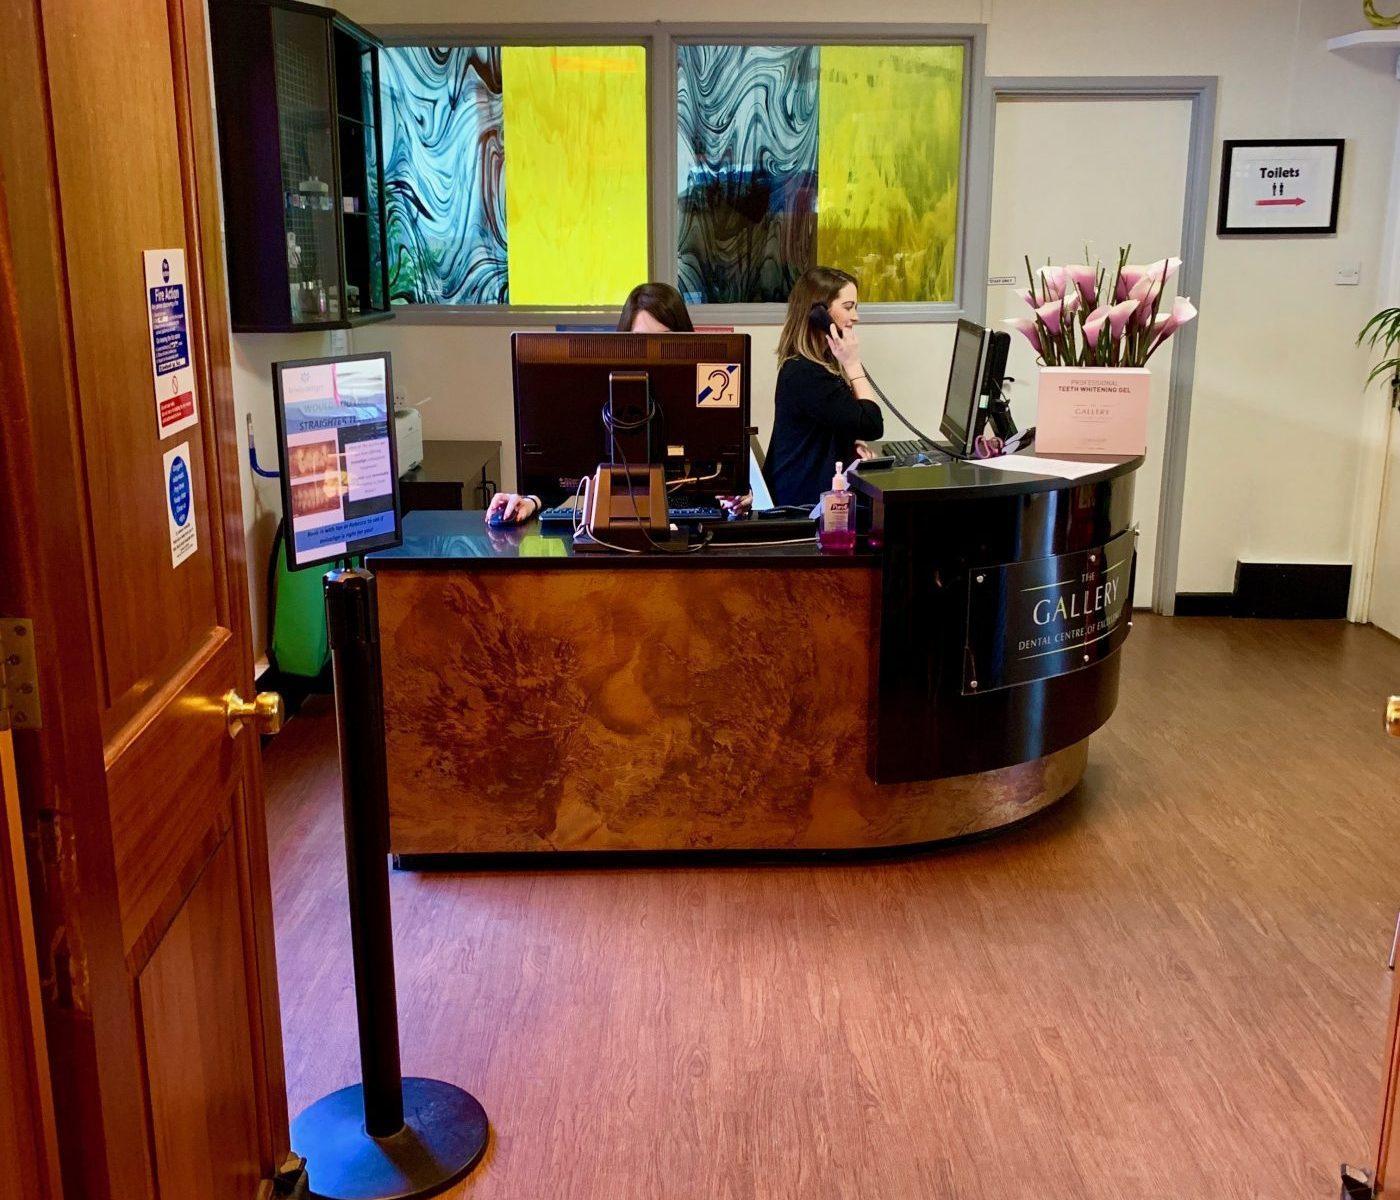 Reception desk at The Gallery Dental